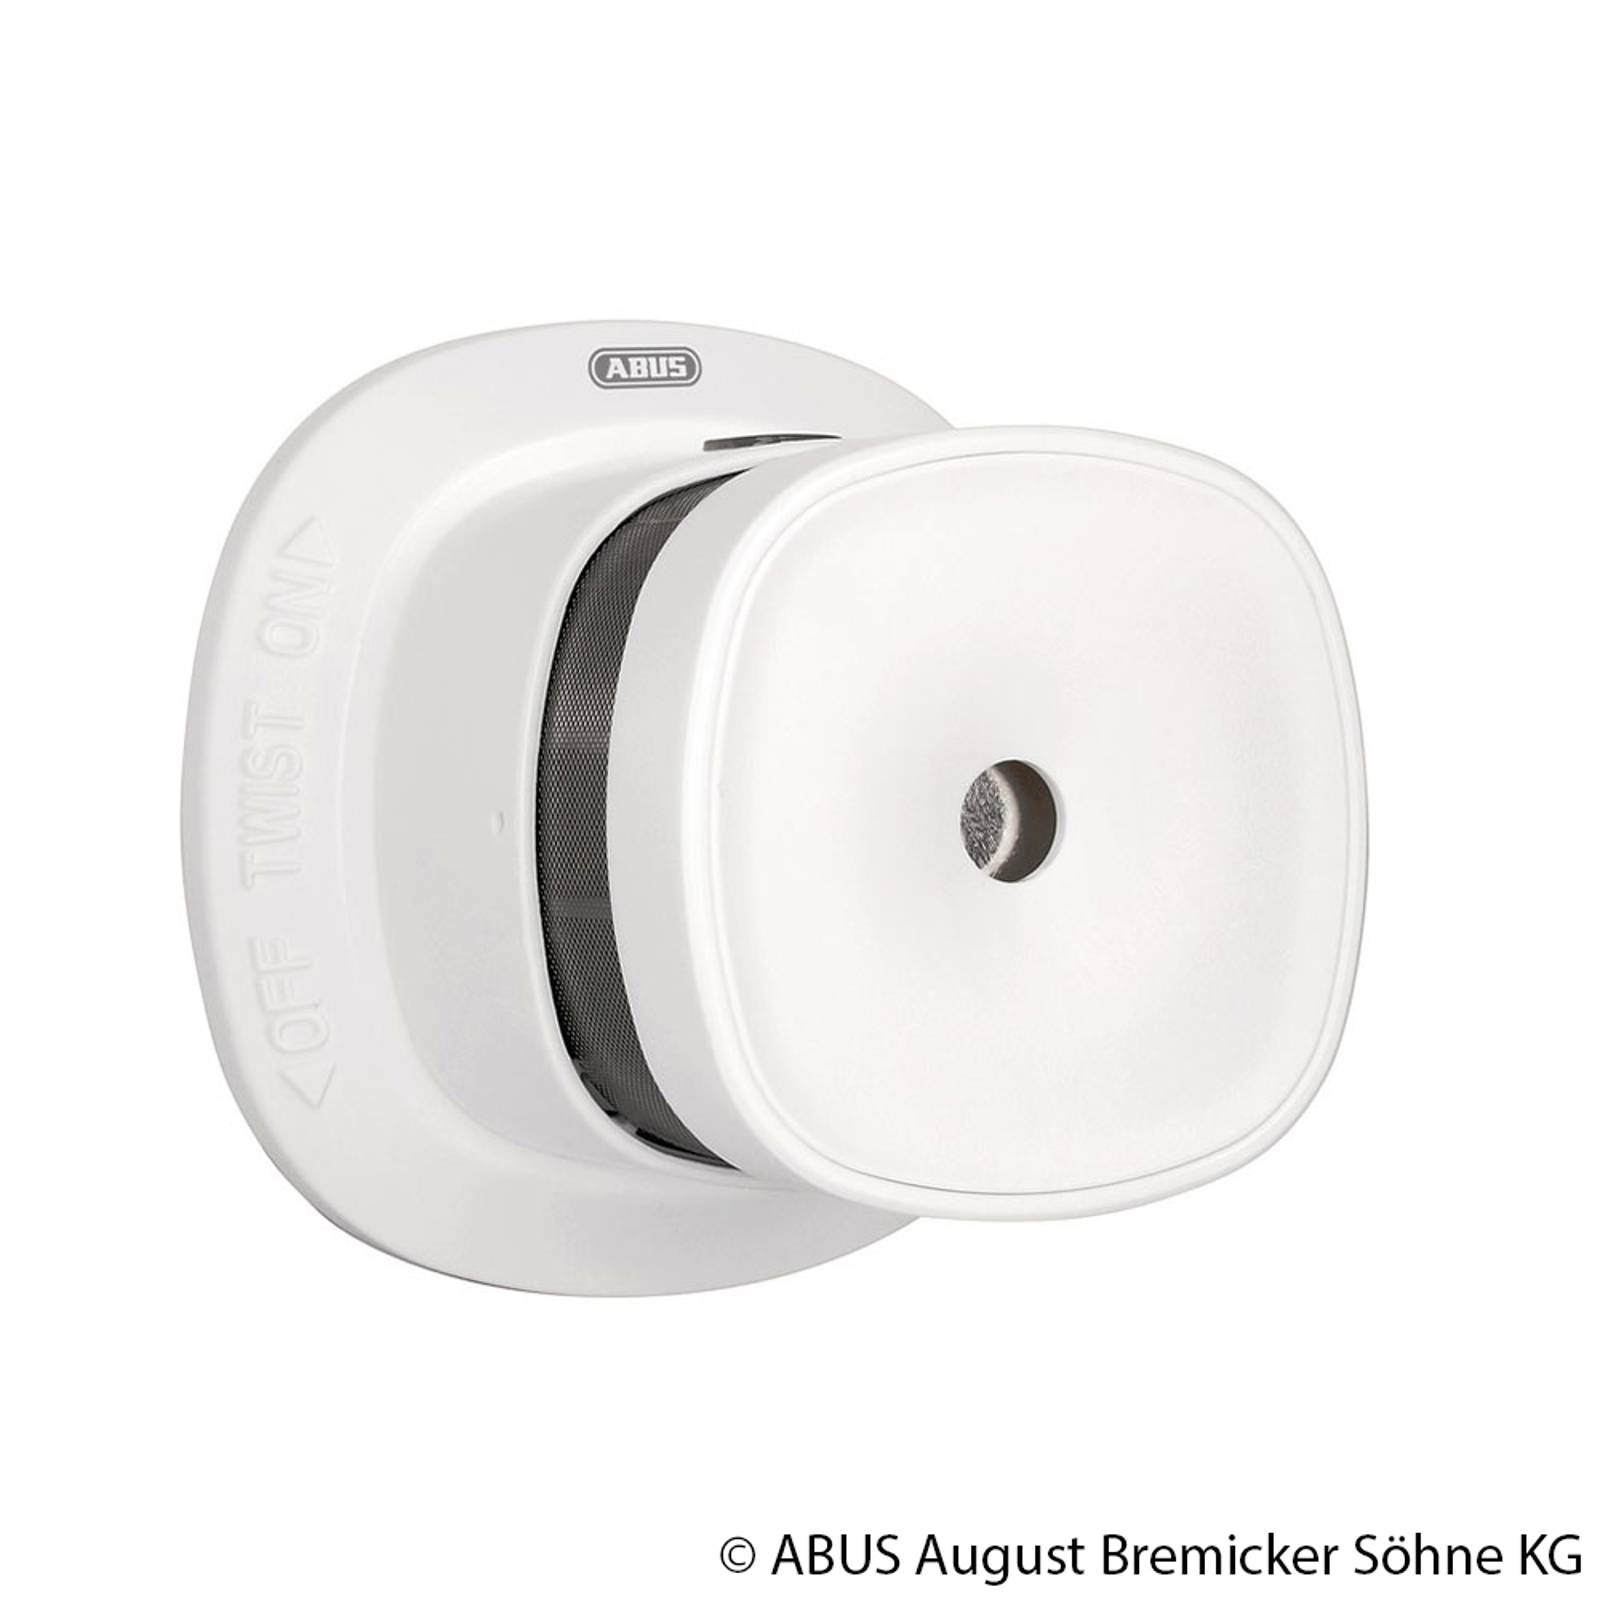 ABUS Z-Wave trådlös rökdetektor